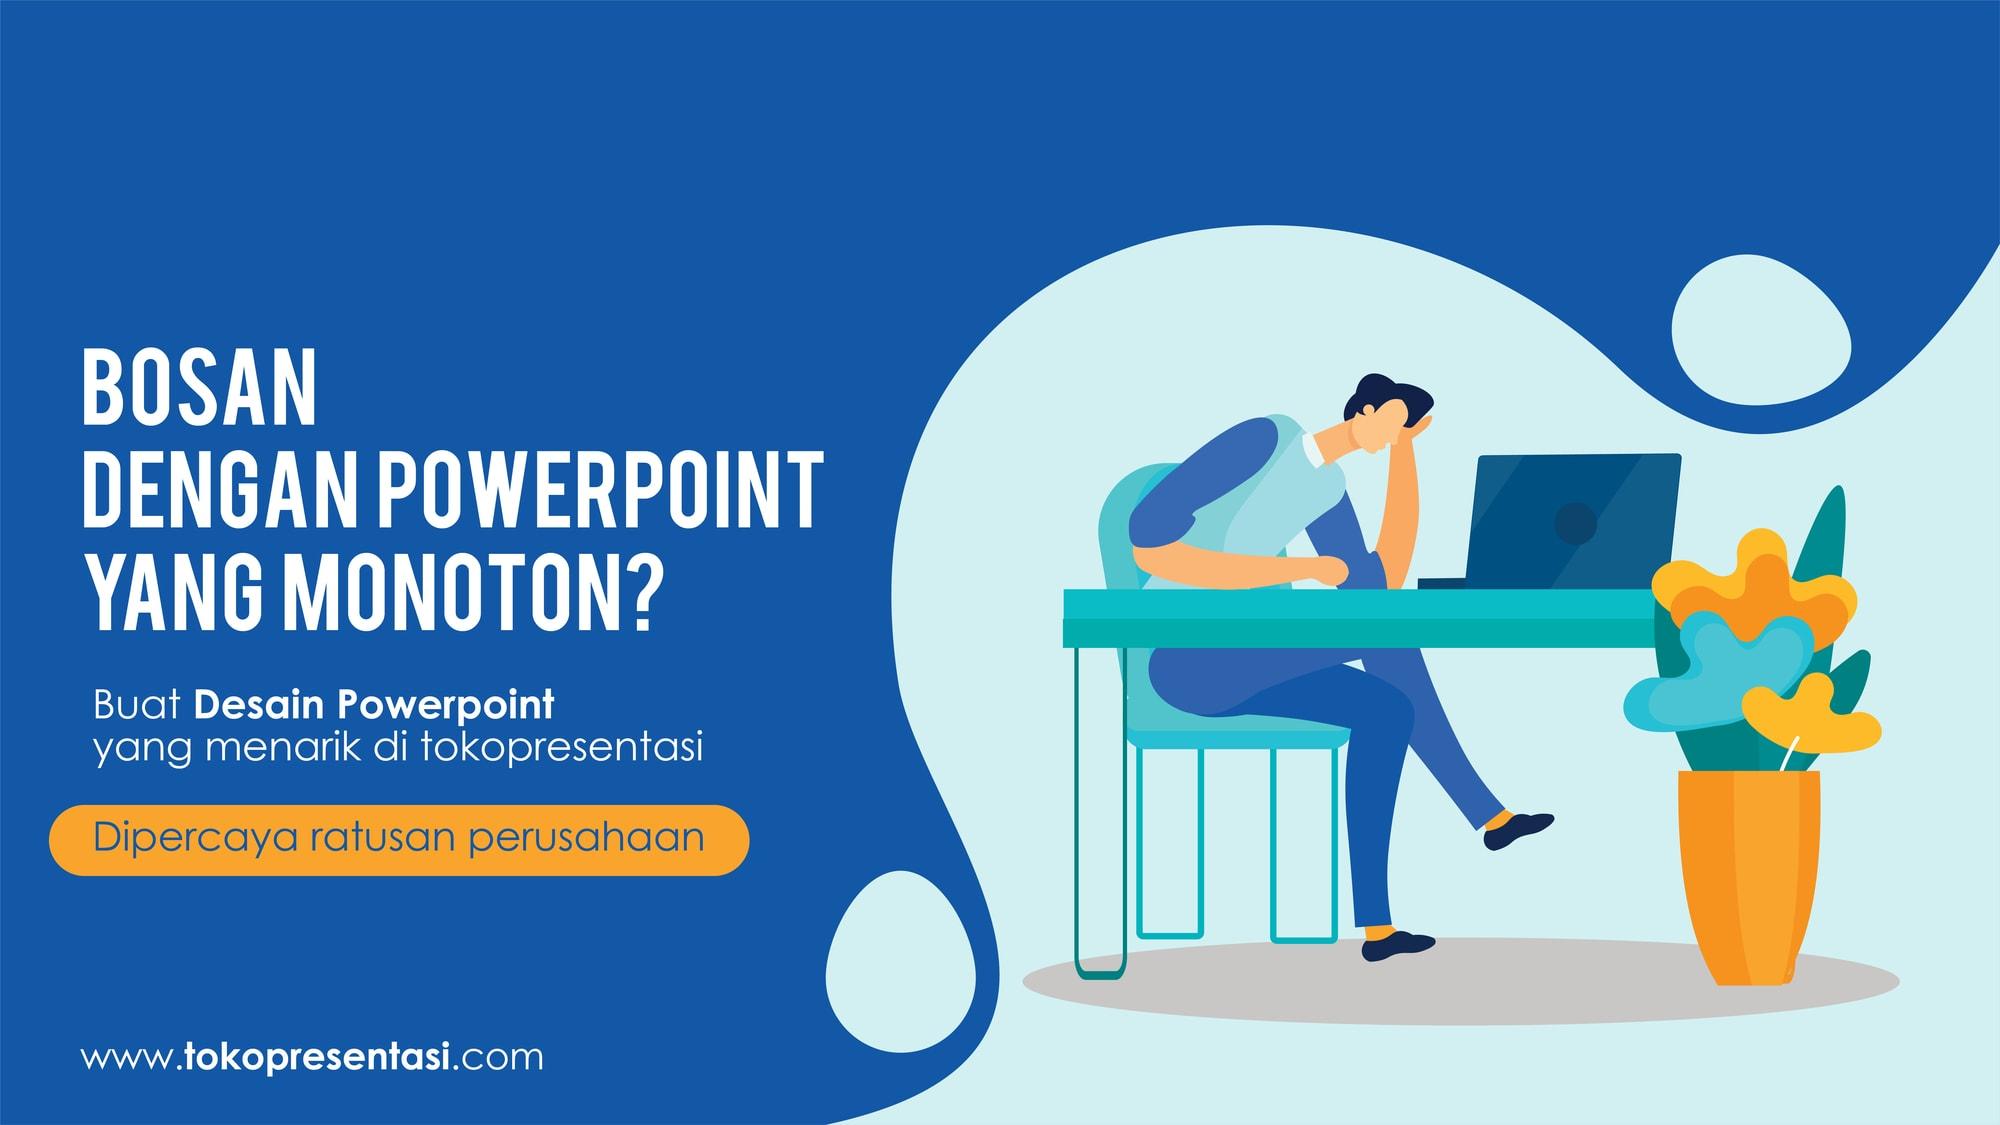 Jasa Pembuatan Desain Presentasi Powerpoint Lomba Inovasi GKM WKM TKMPN Tudung Putra Putri Jaya Tokopresentasi